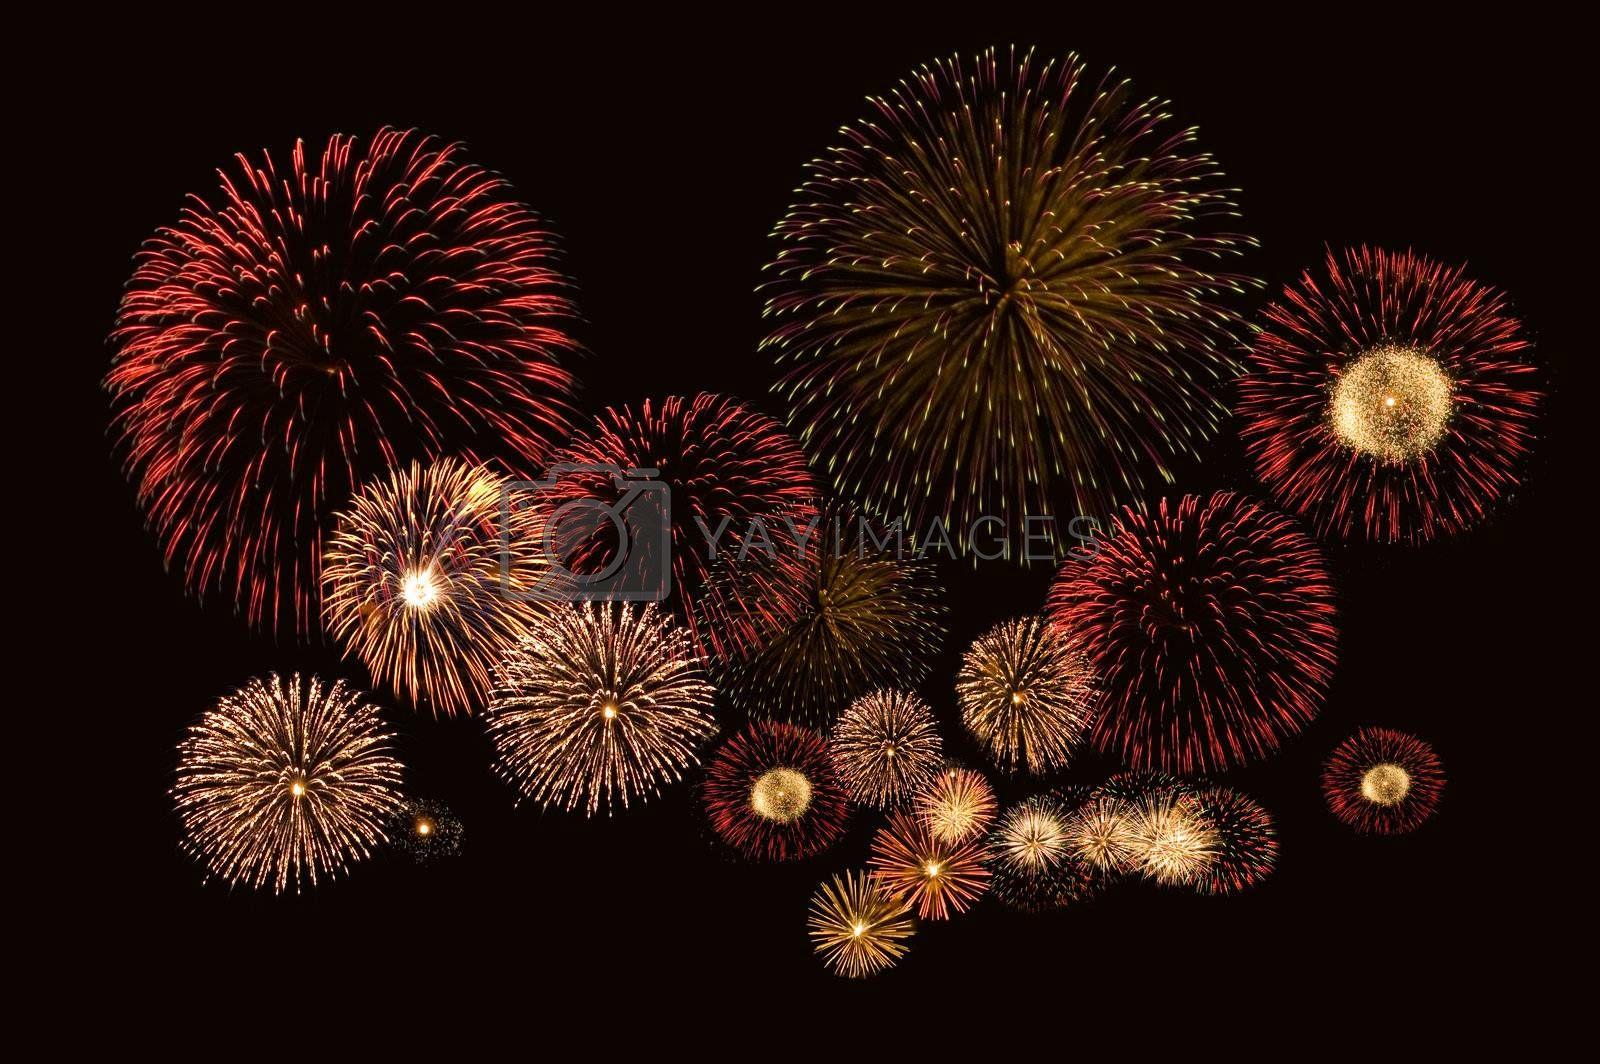 Beautiful fireworks on black background